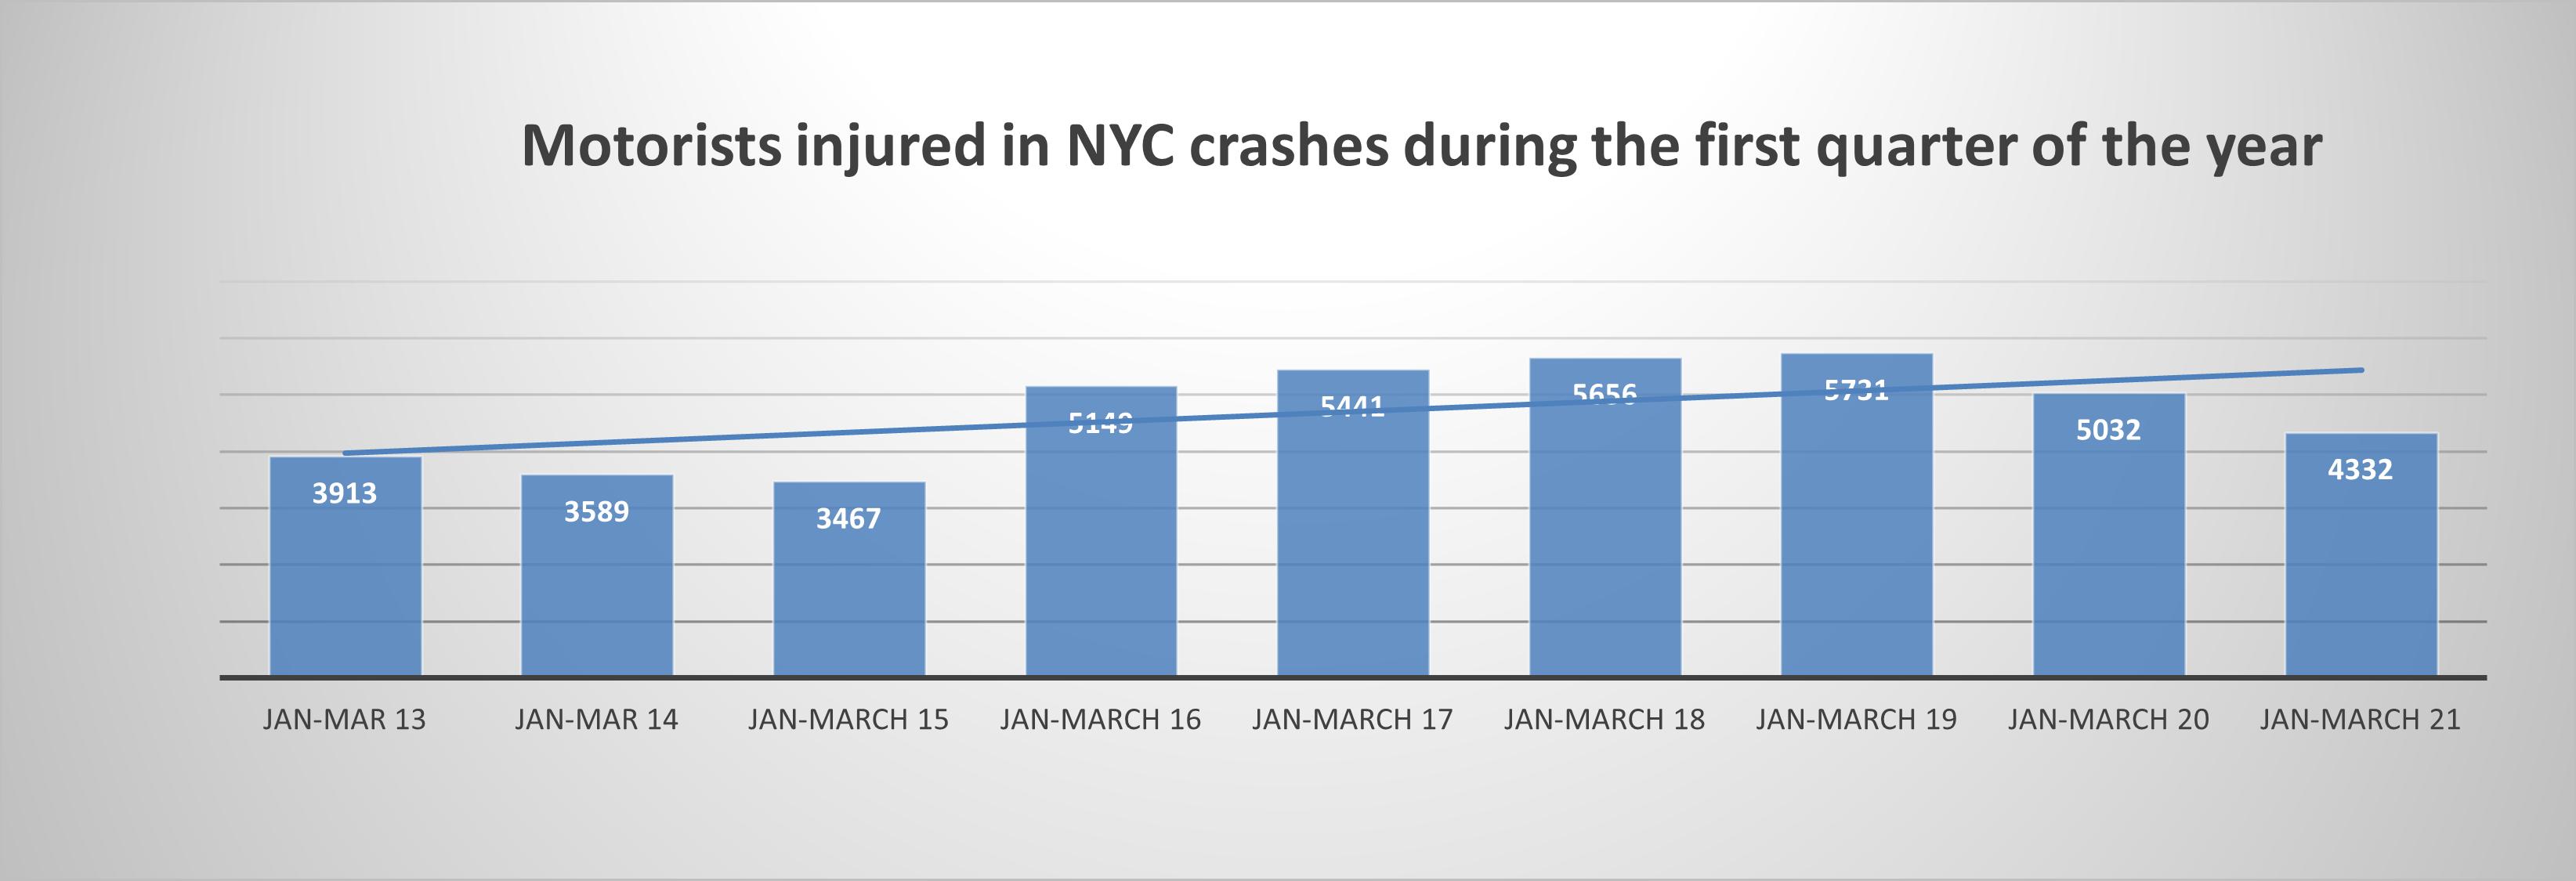 Motorist injuries in New York Q1 2021